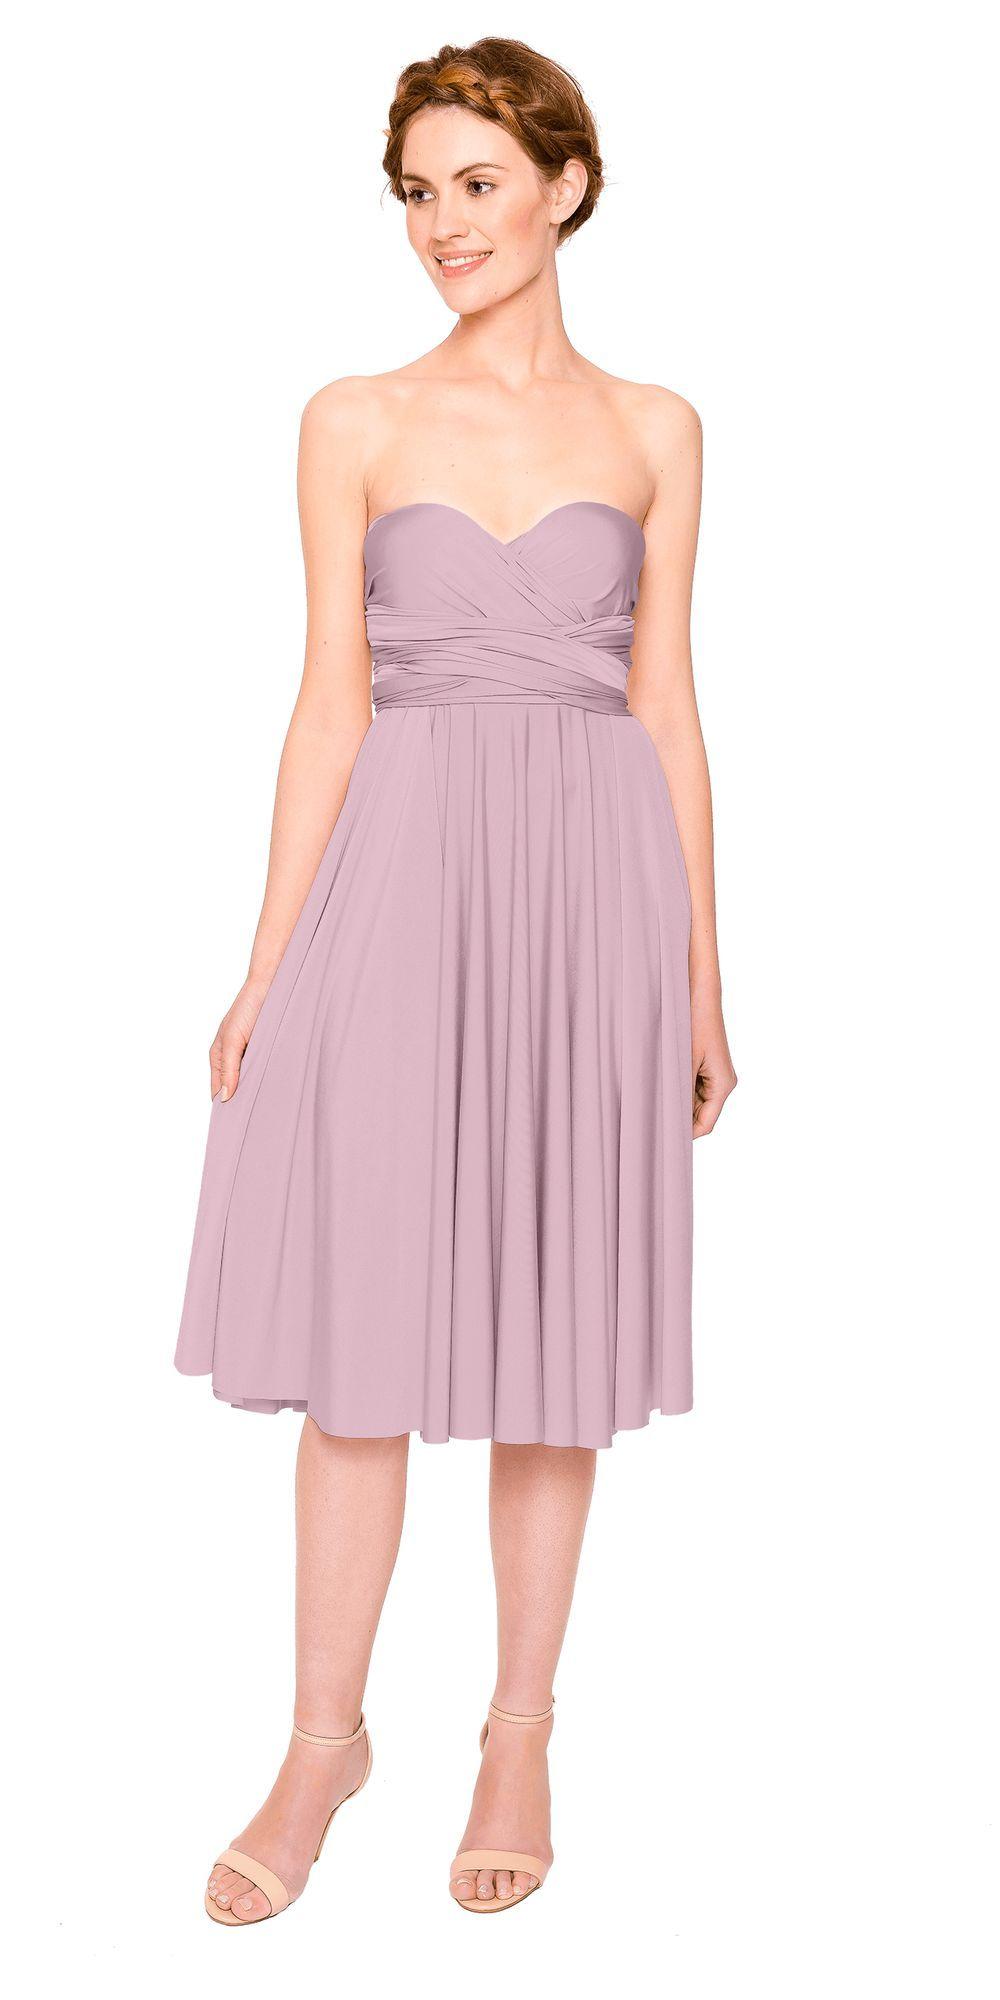 Strapless knee length bridesmaid dress   A twobirds bridesmaid ...